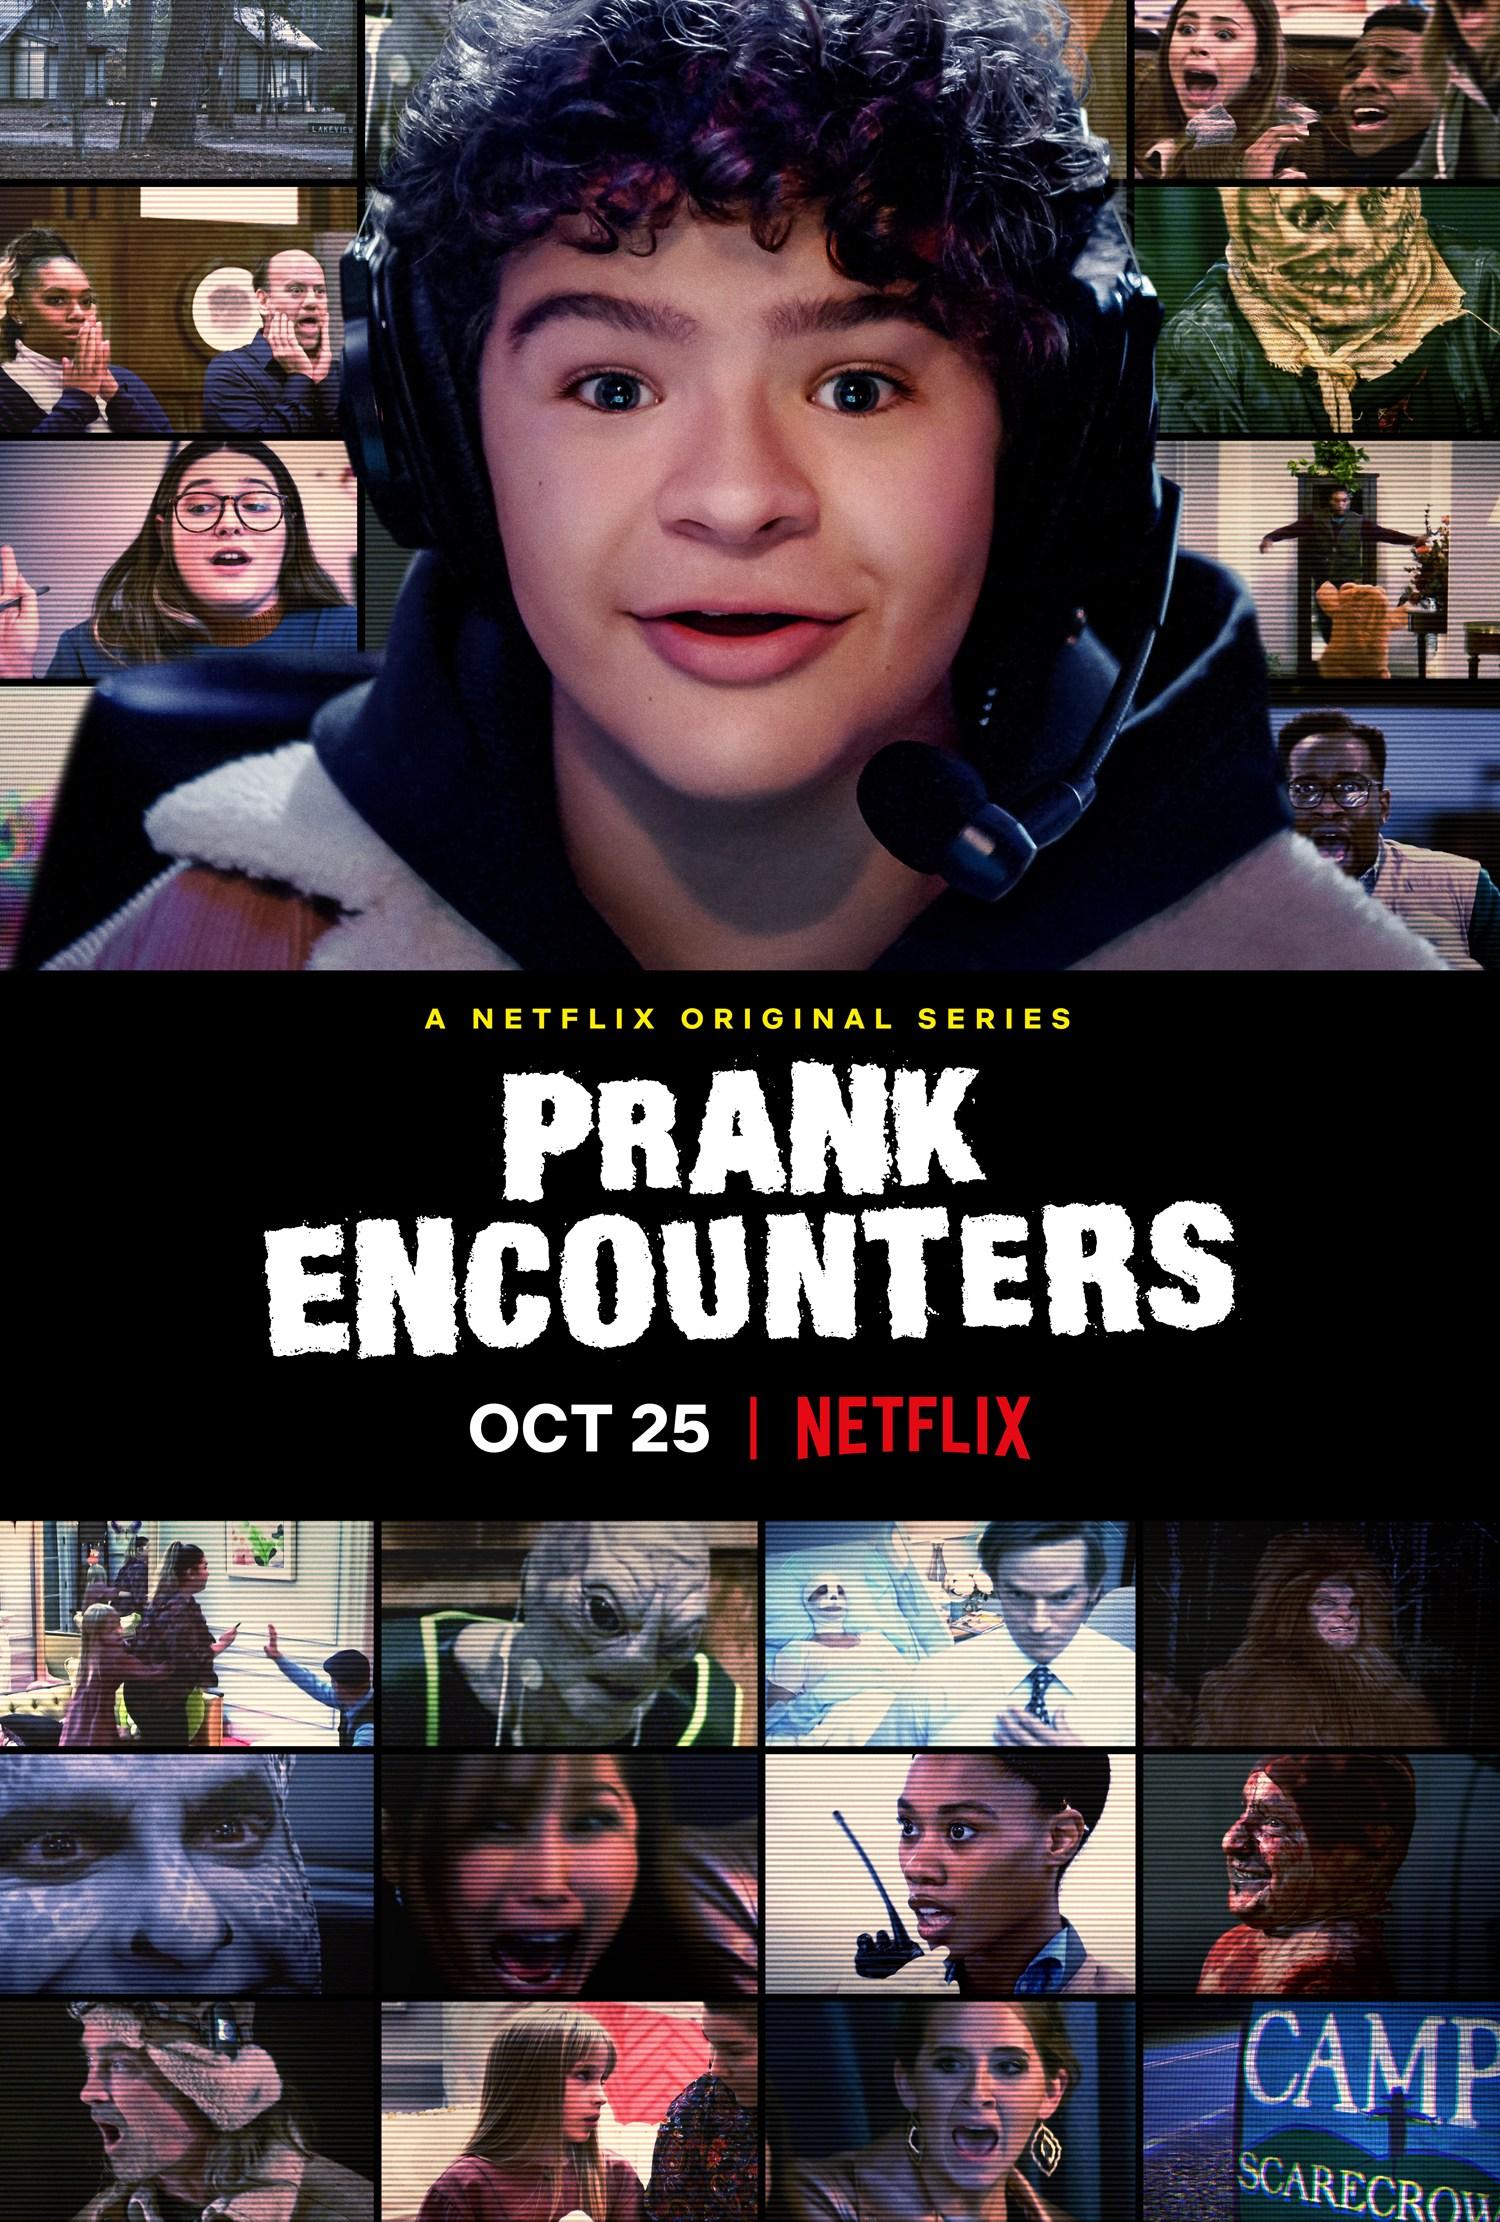 Prank Encounters Netflix affiche